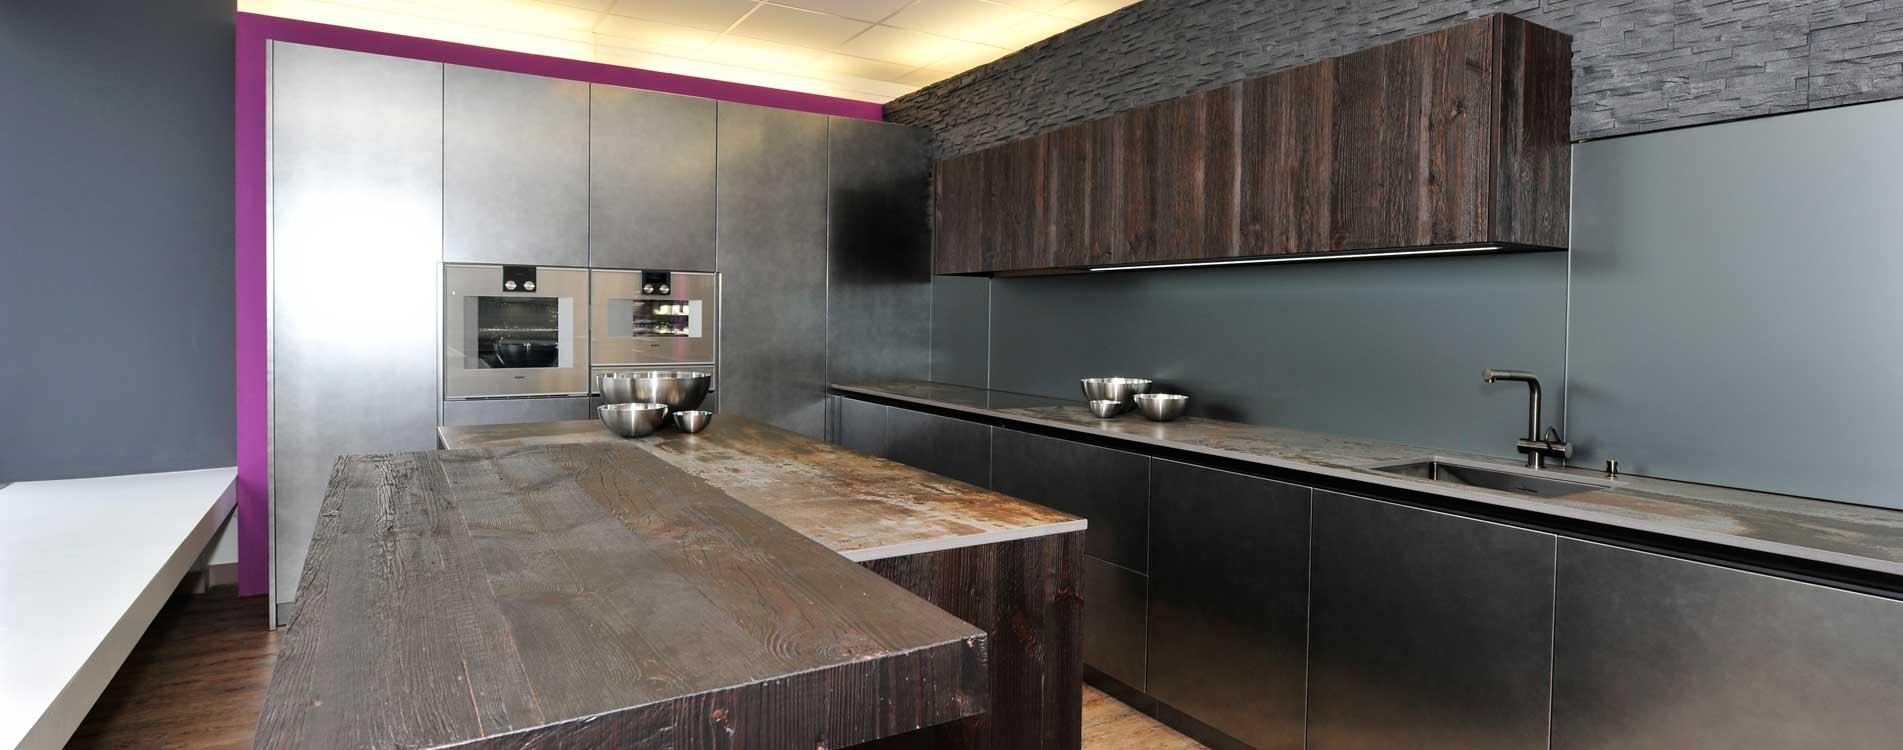 Cuisine quip e ouverte designo cuisine for Cuisine equipee ouverte